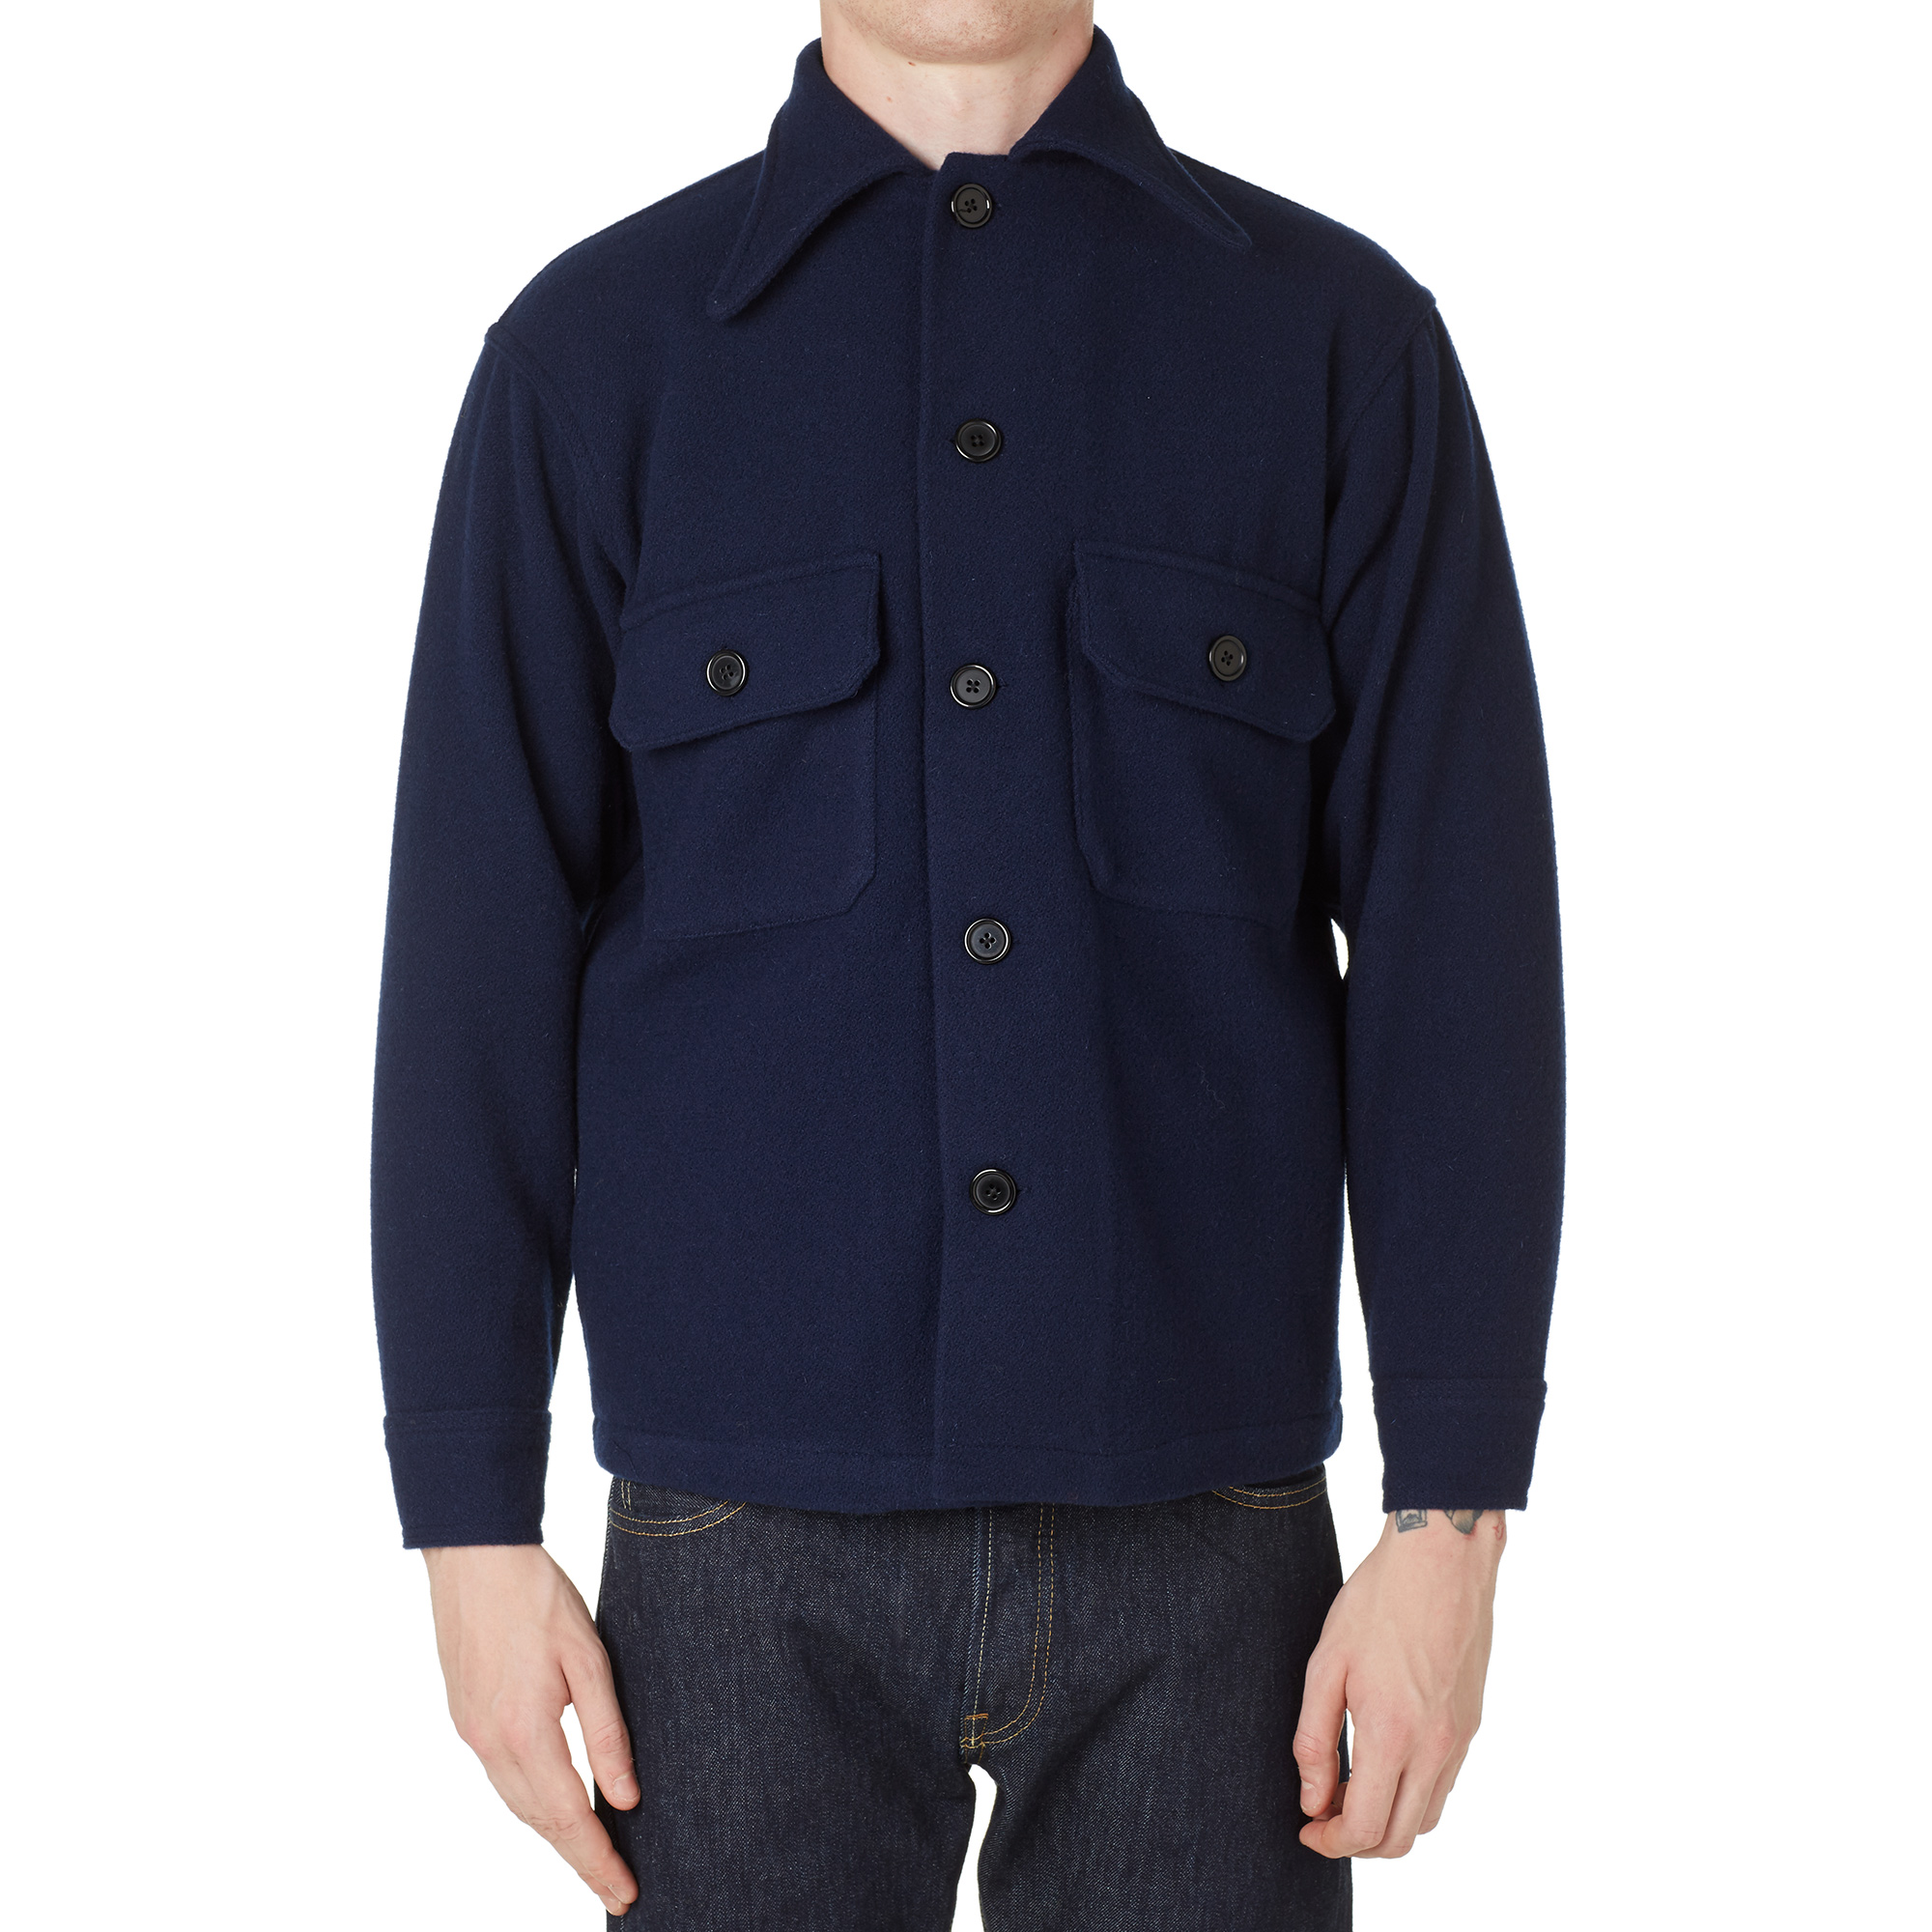 Levi&39s Vintage Clothing Wool Shirt Jacket (Bright Navy)